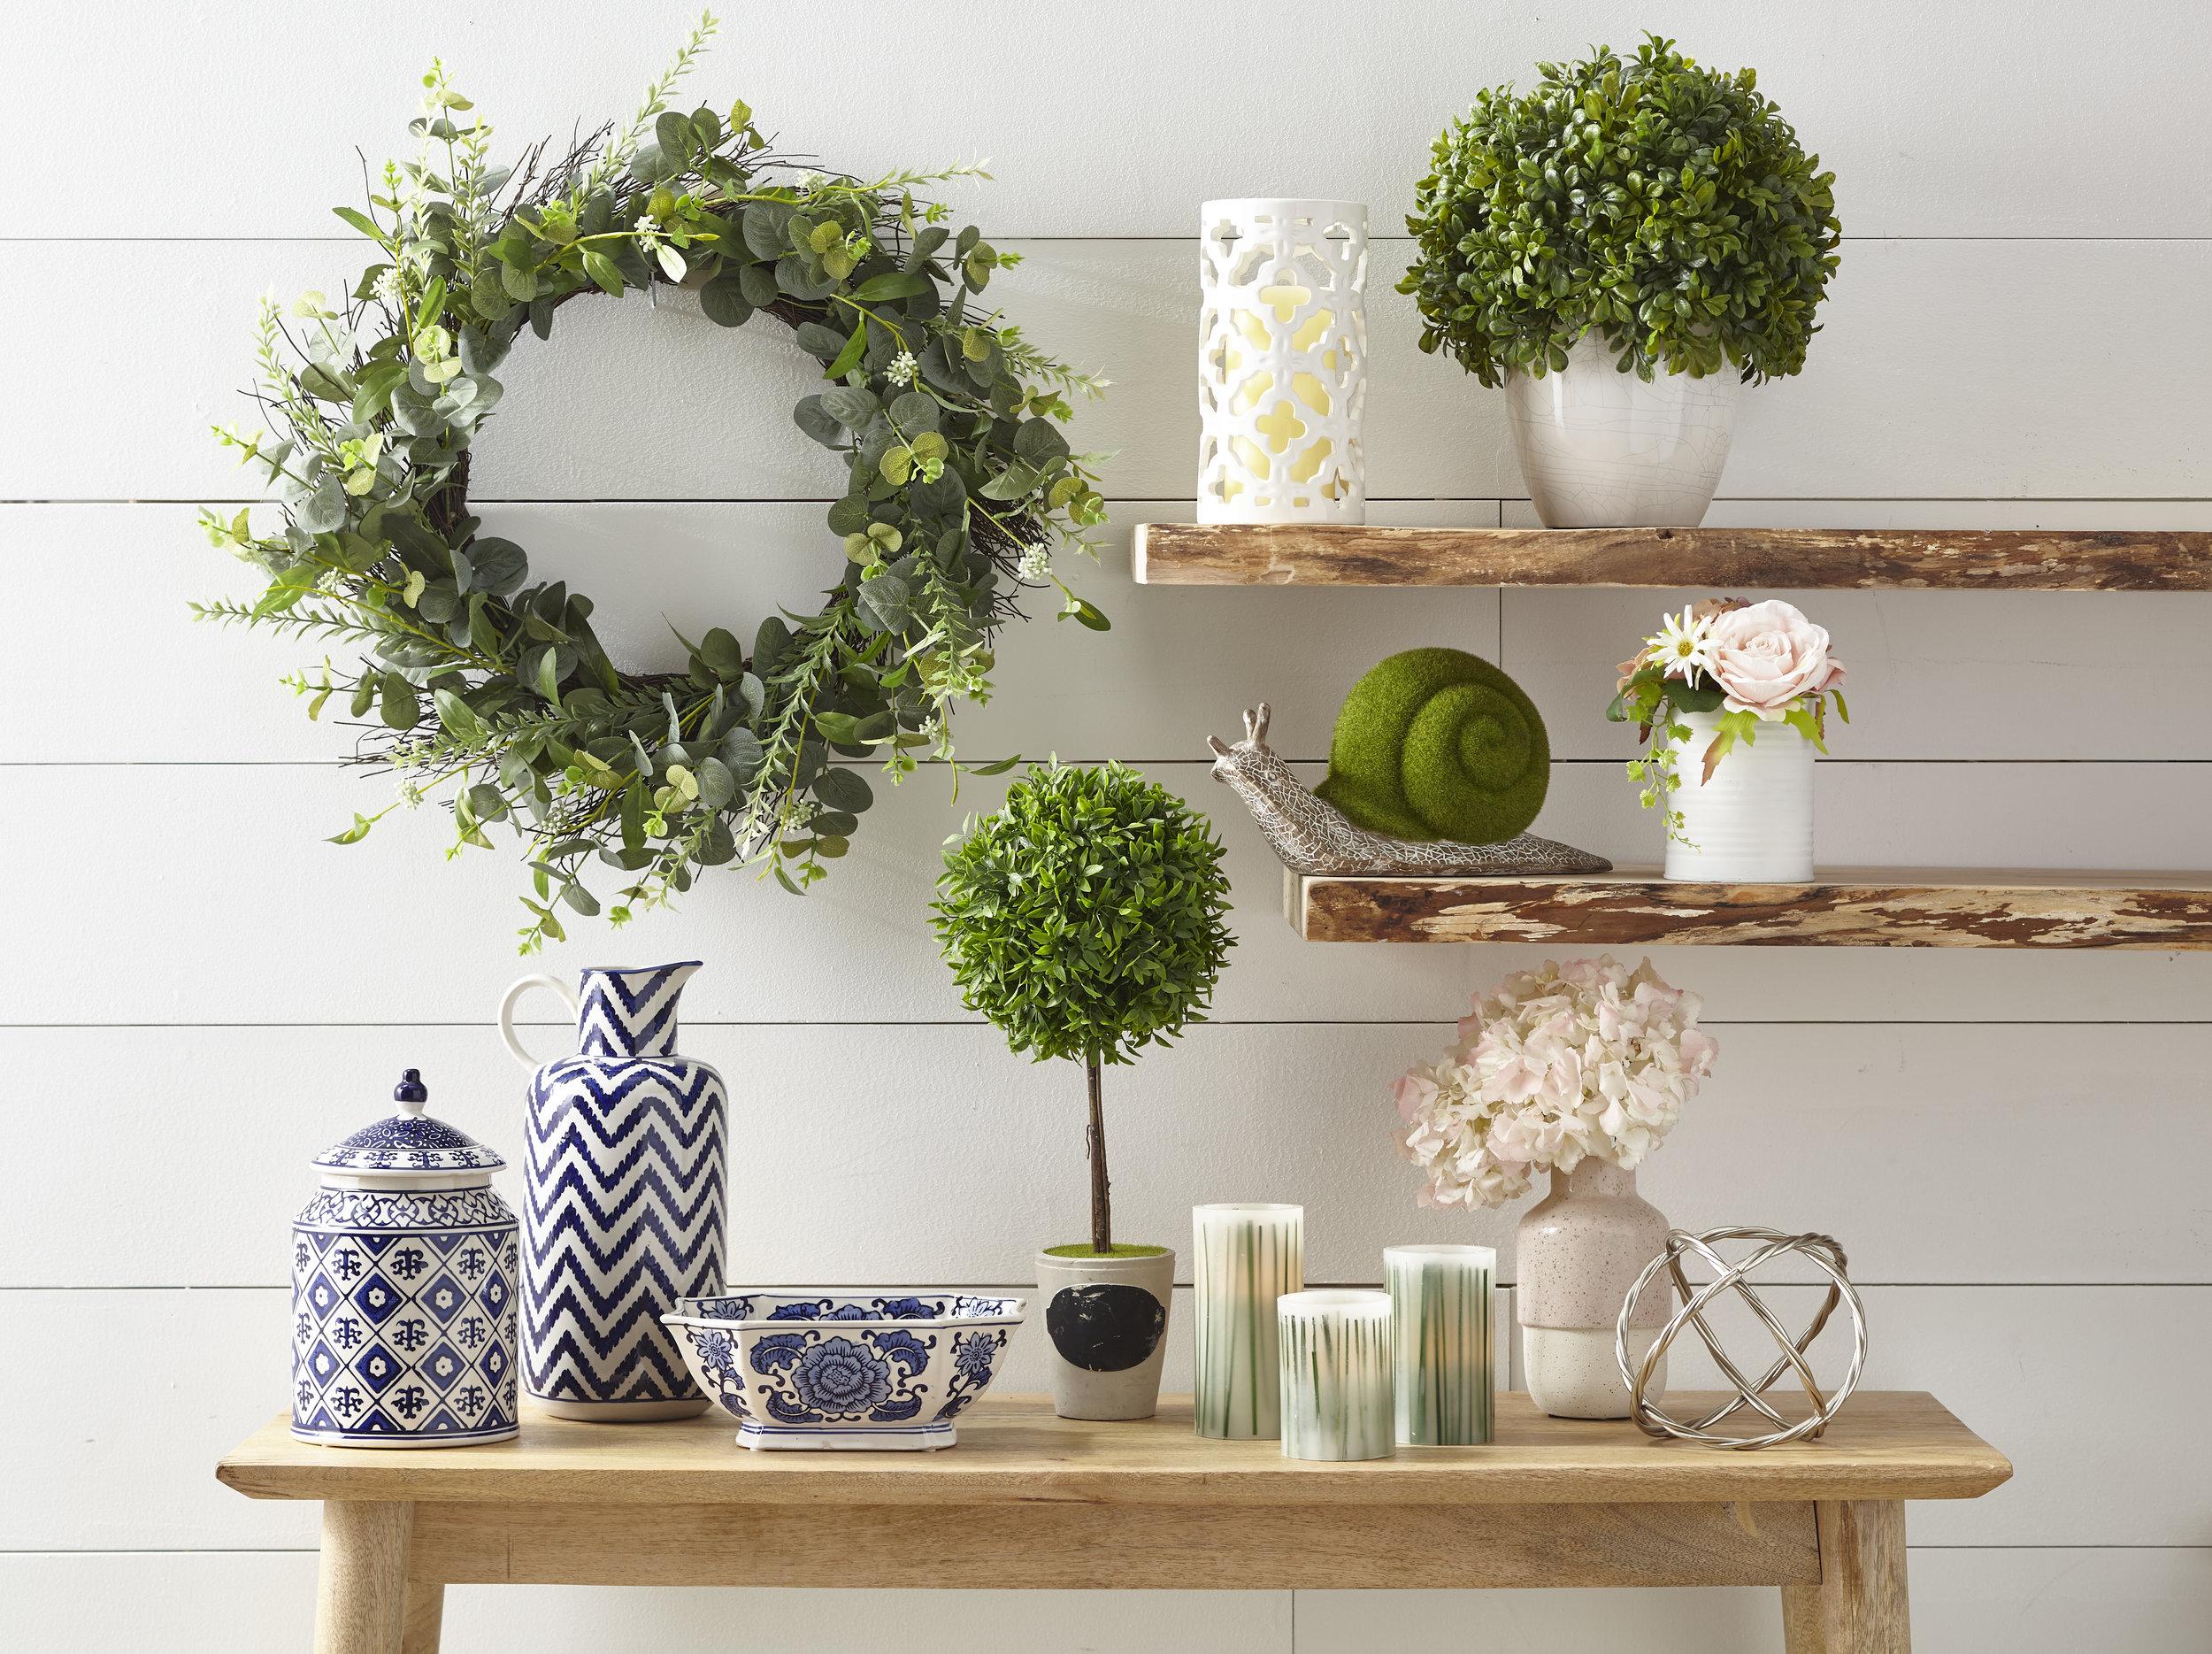 decorations_greens.jpg